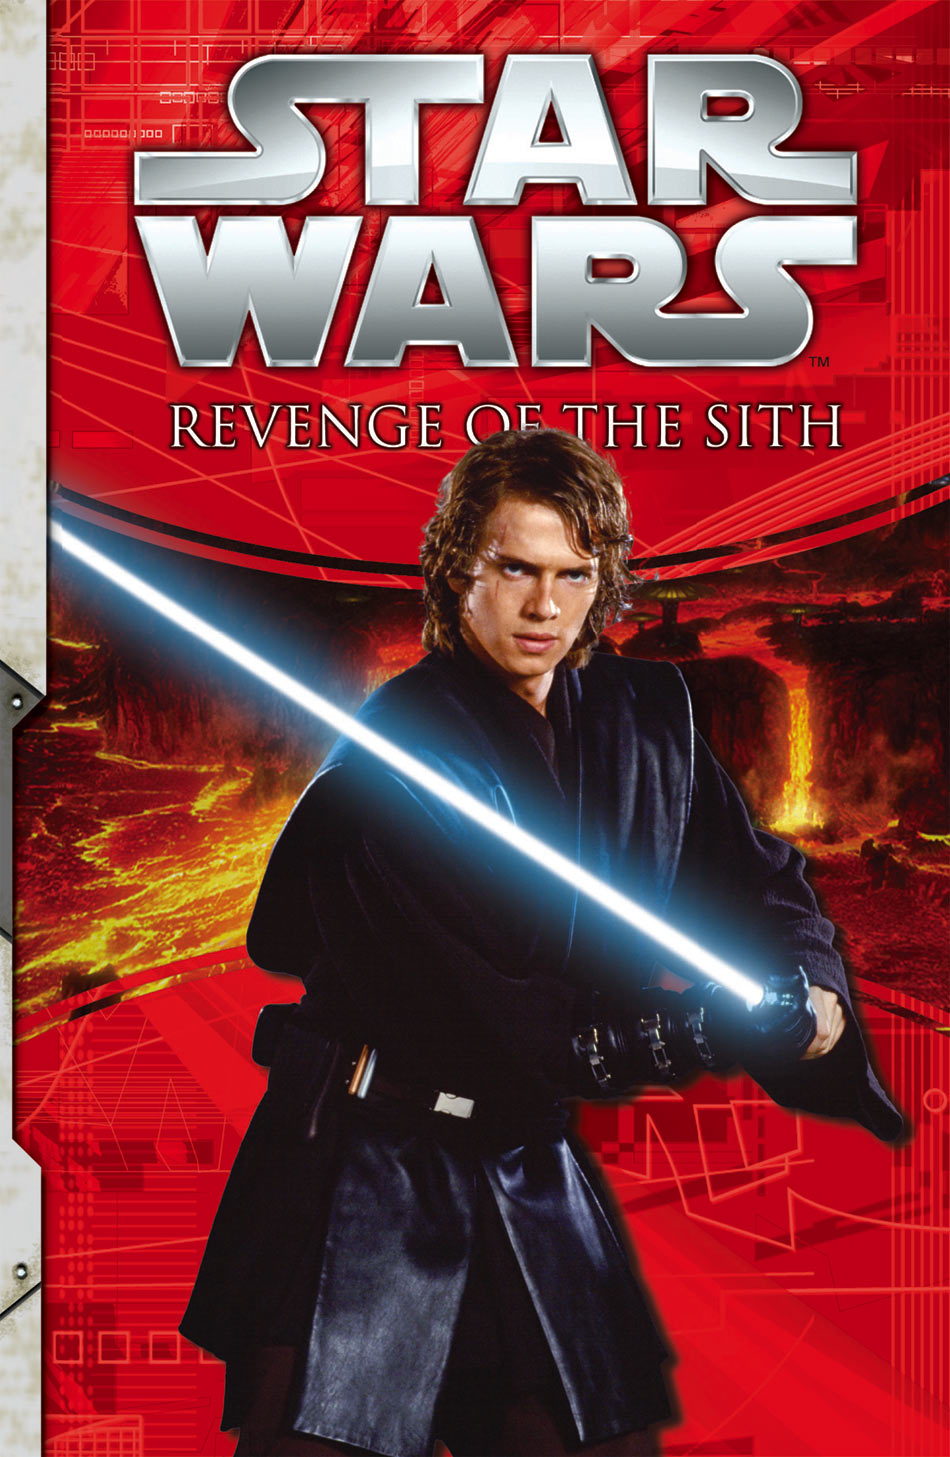 Star Wars: Revenge of the Sith (Photo Comic)